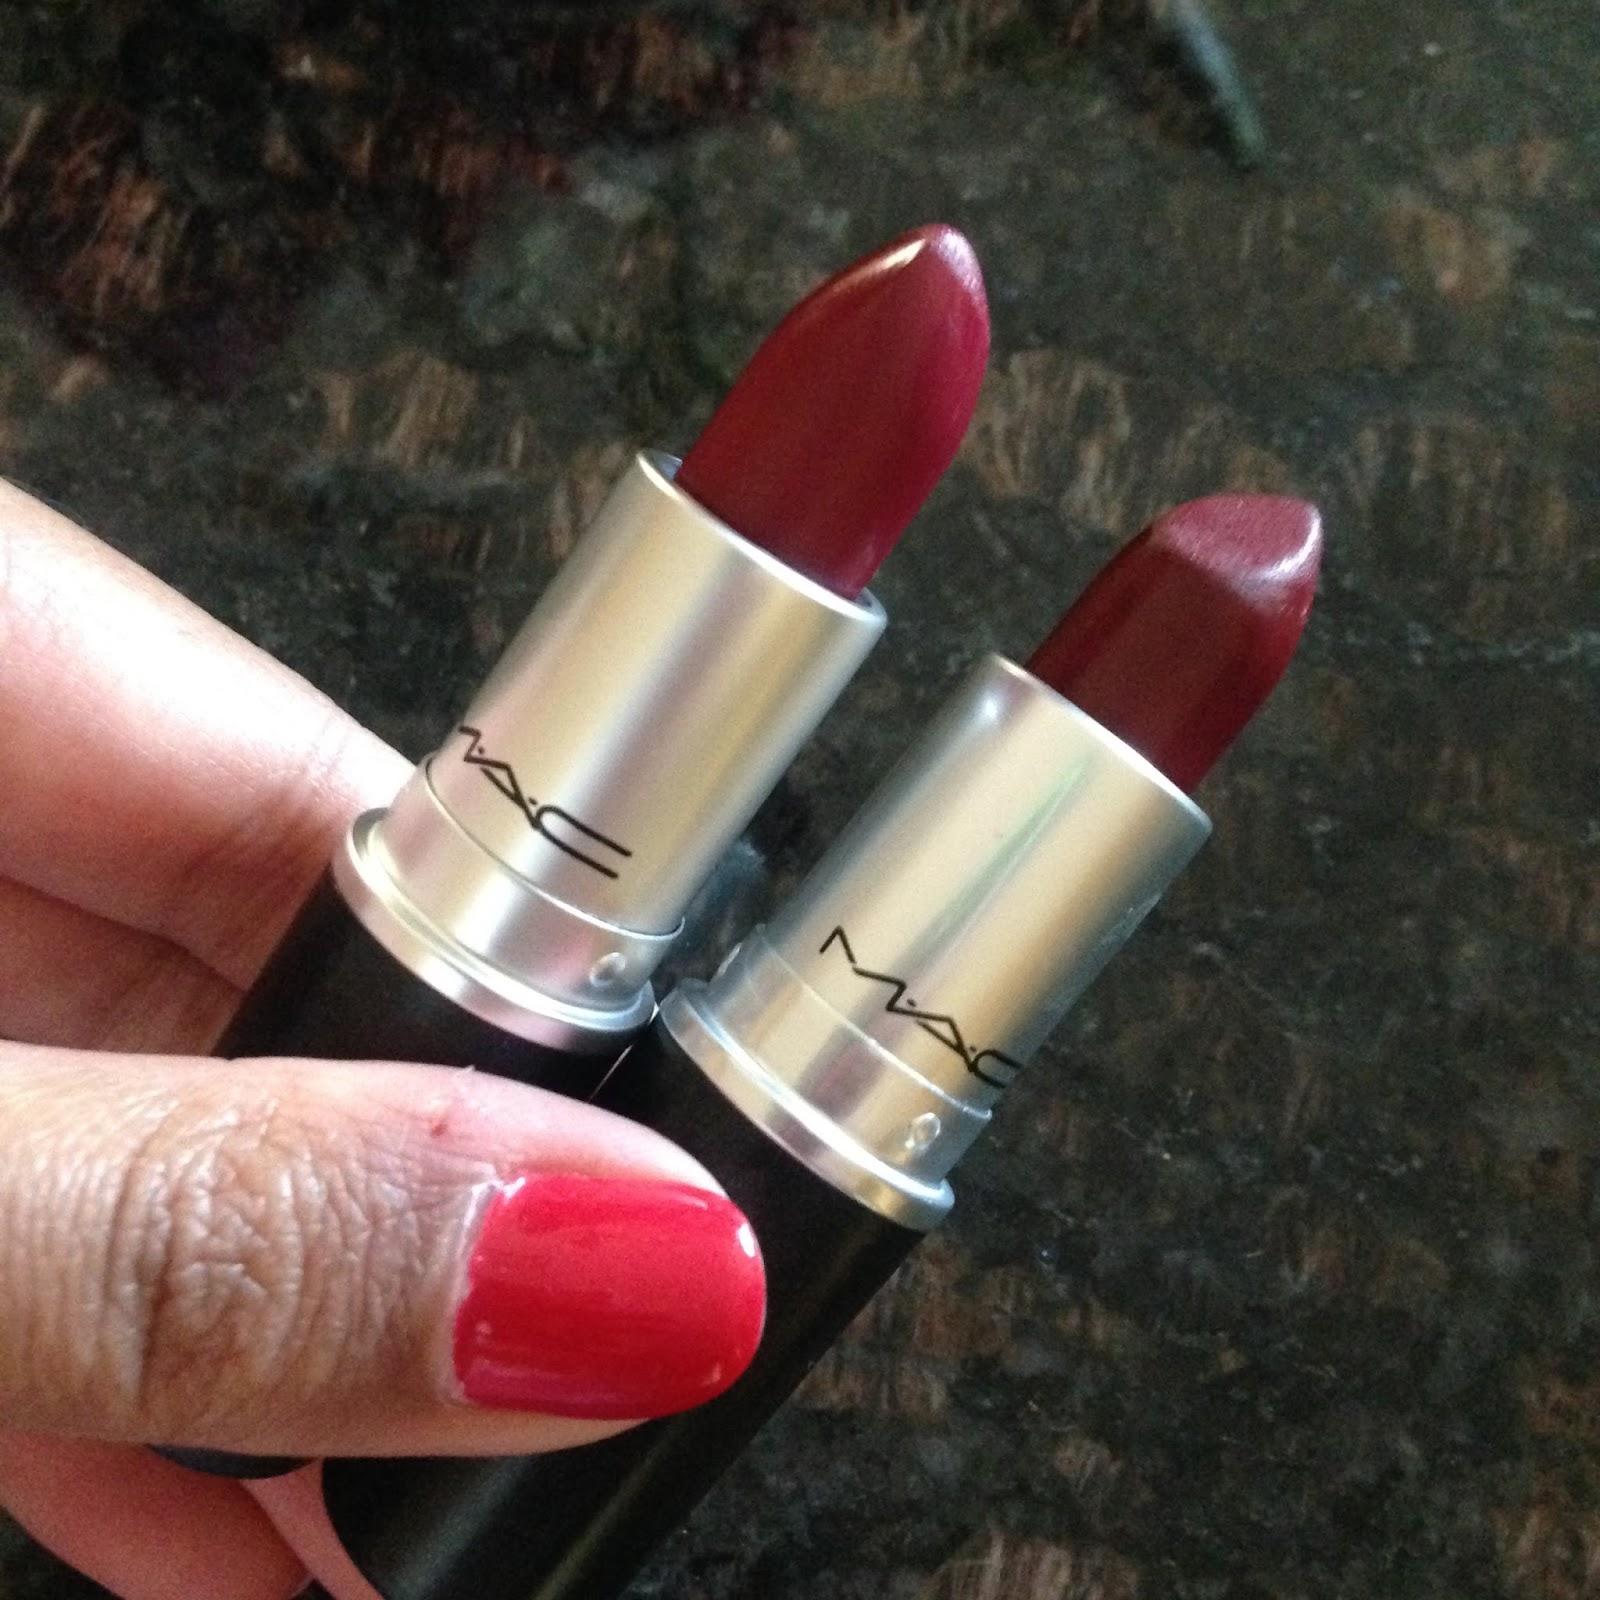 Mac d for danger and diva plus diva 39 s dupe floraful - Mac cosmetics lipstick diva ...